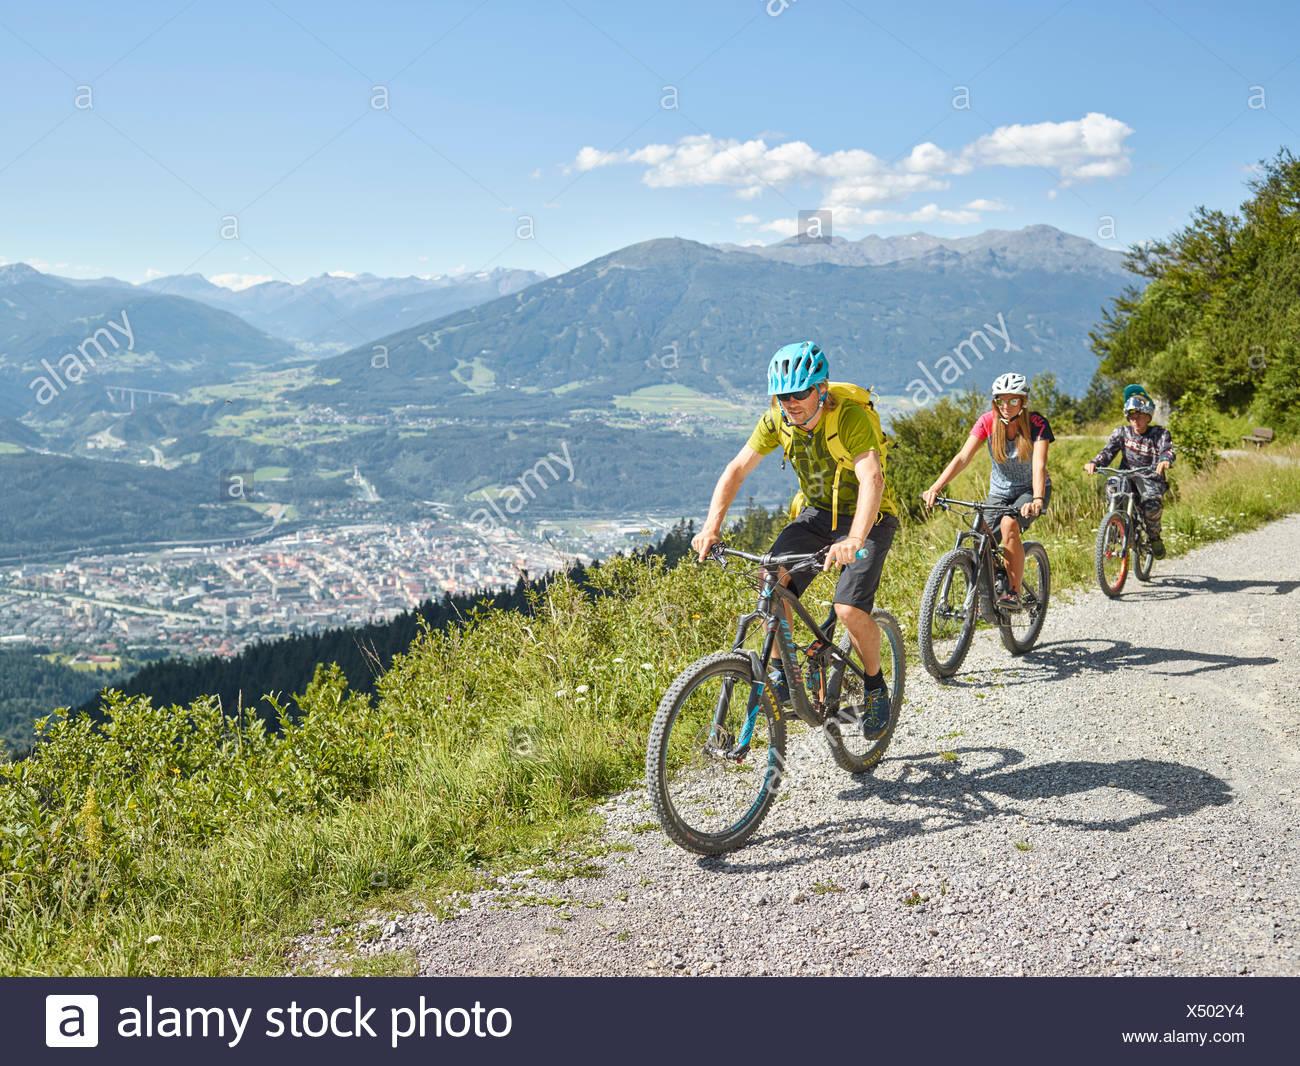 Famille en vtt, chemin de terre, Innsbruck derrière, vallée de l'Inn, Tyrol, Autriche Photo Stock